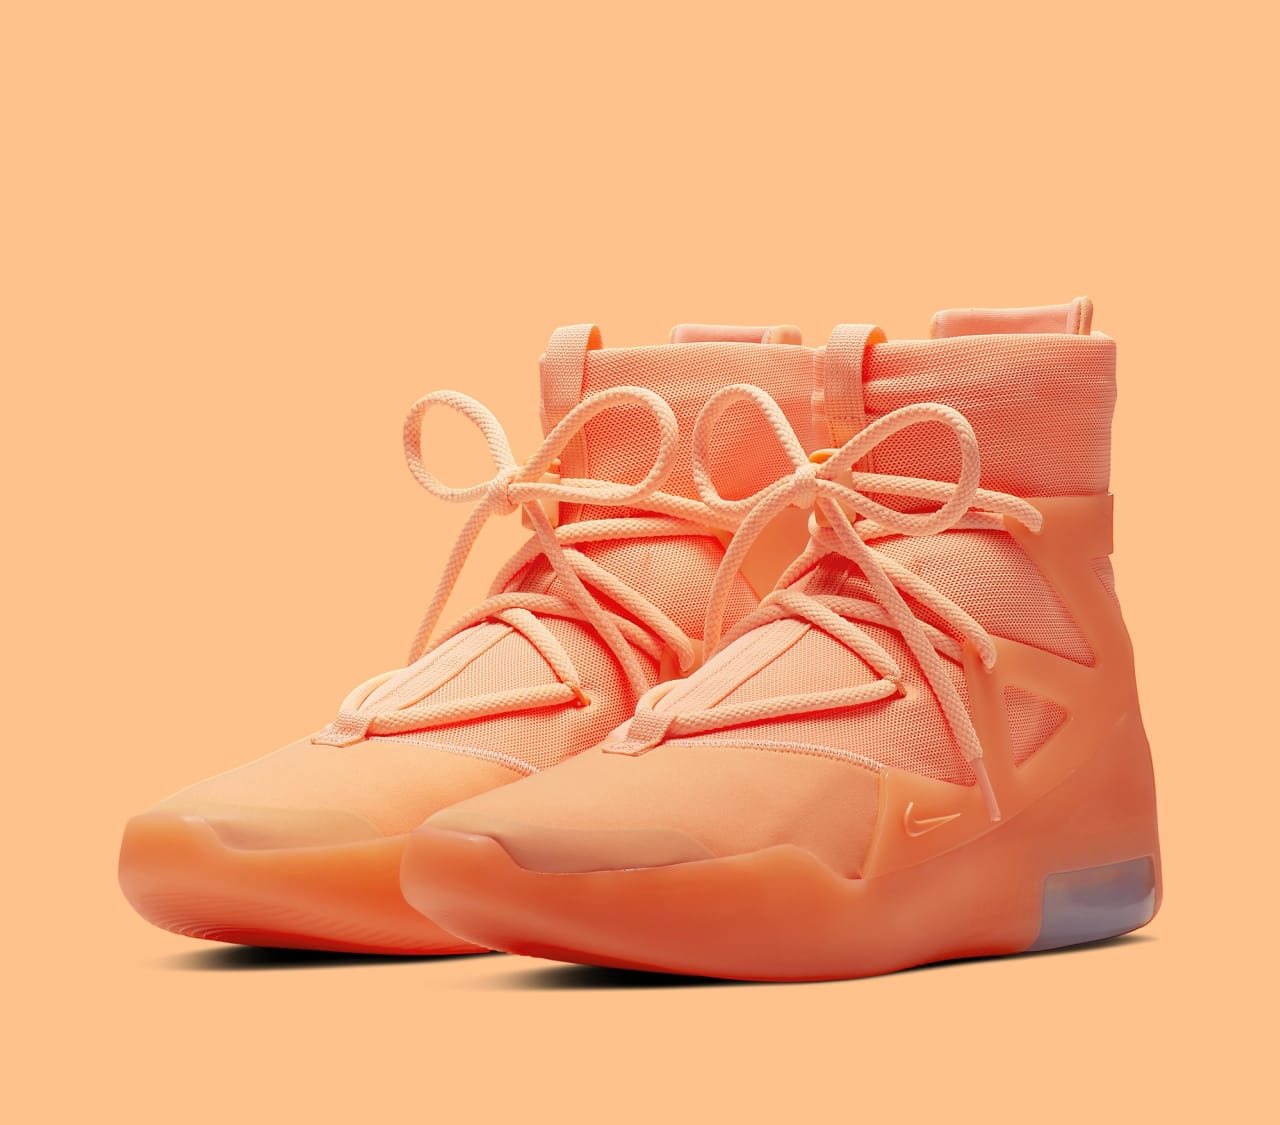 dfc32ccbe7b Nike Air Fear of God 1 'Orange Pulse' Release Date AR4237-800 Summer 2019 |  Sole Collector